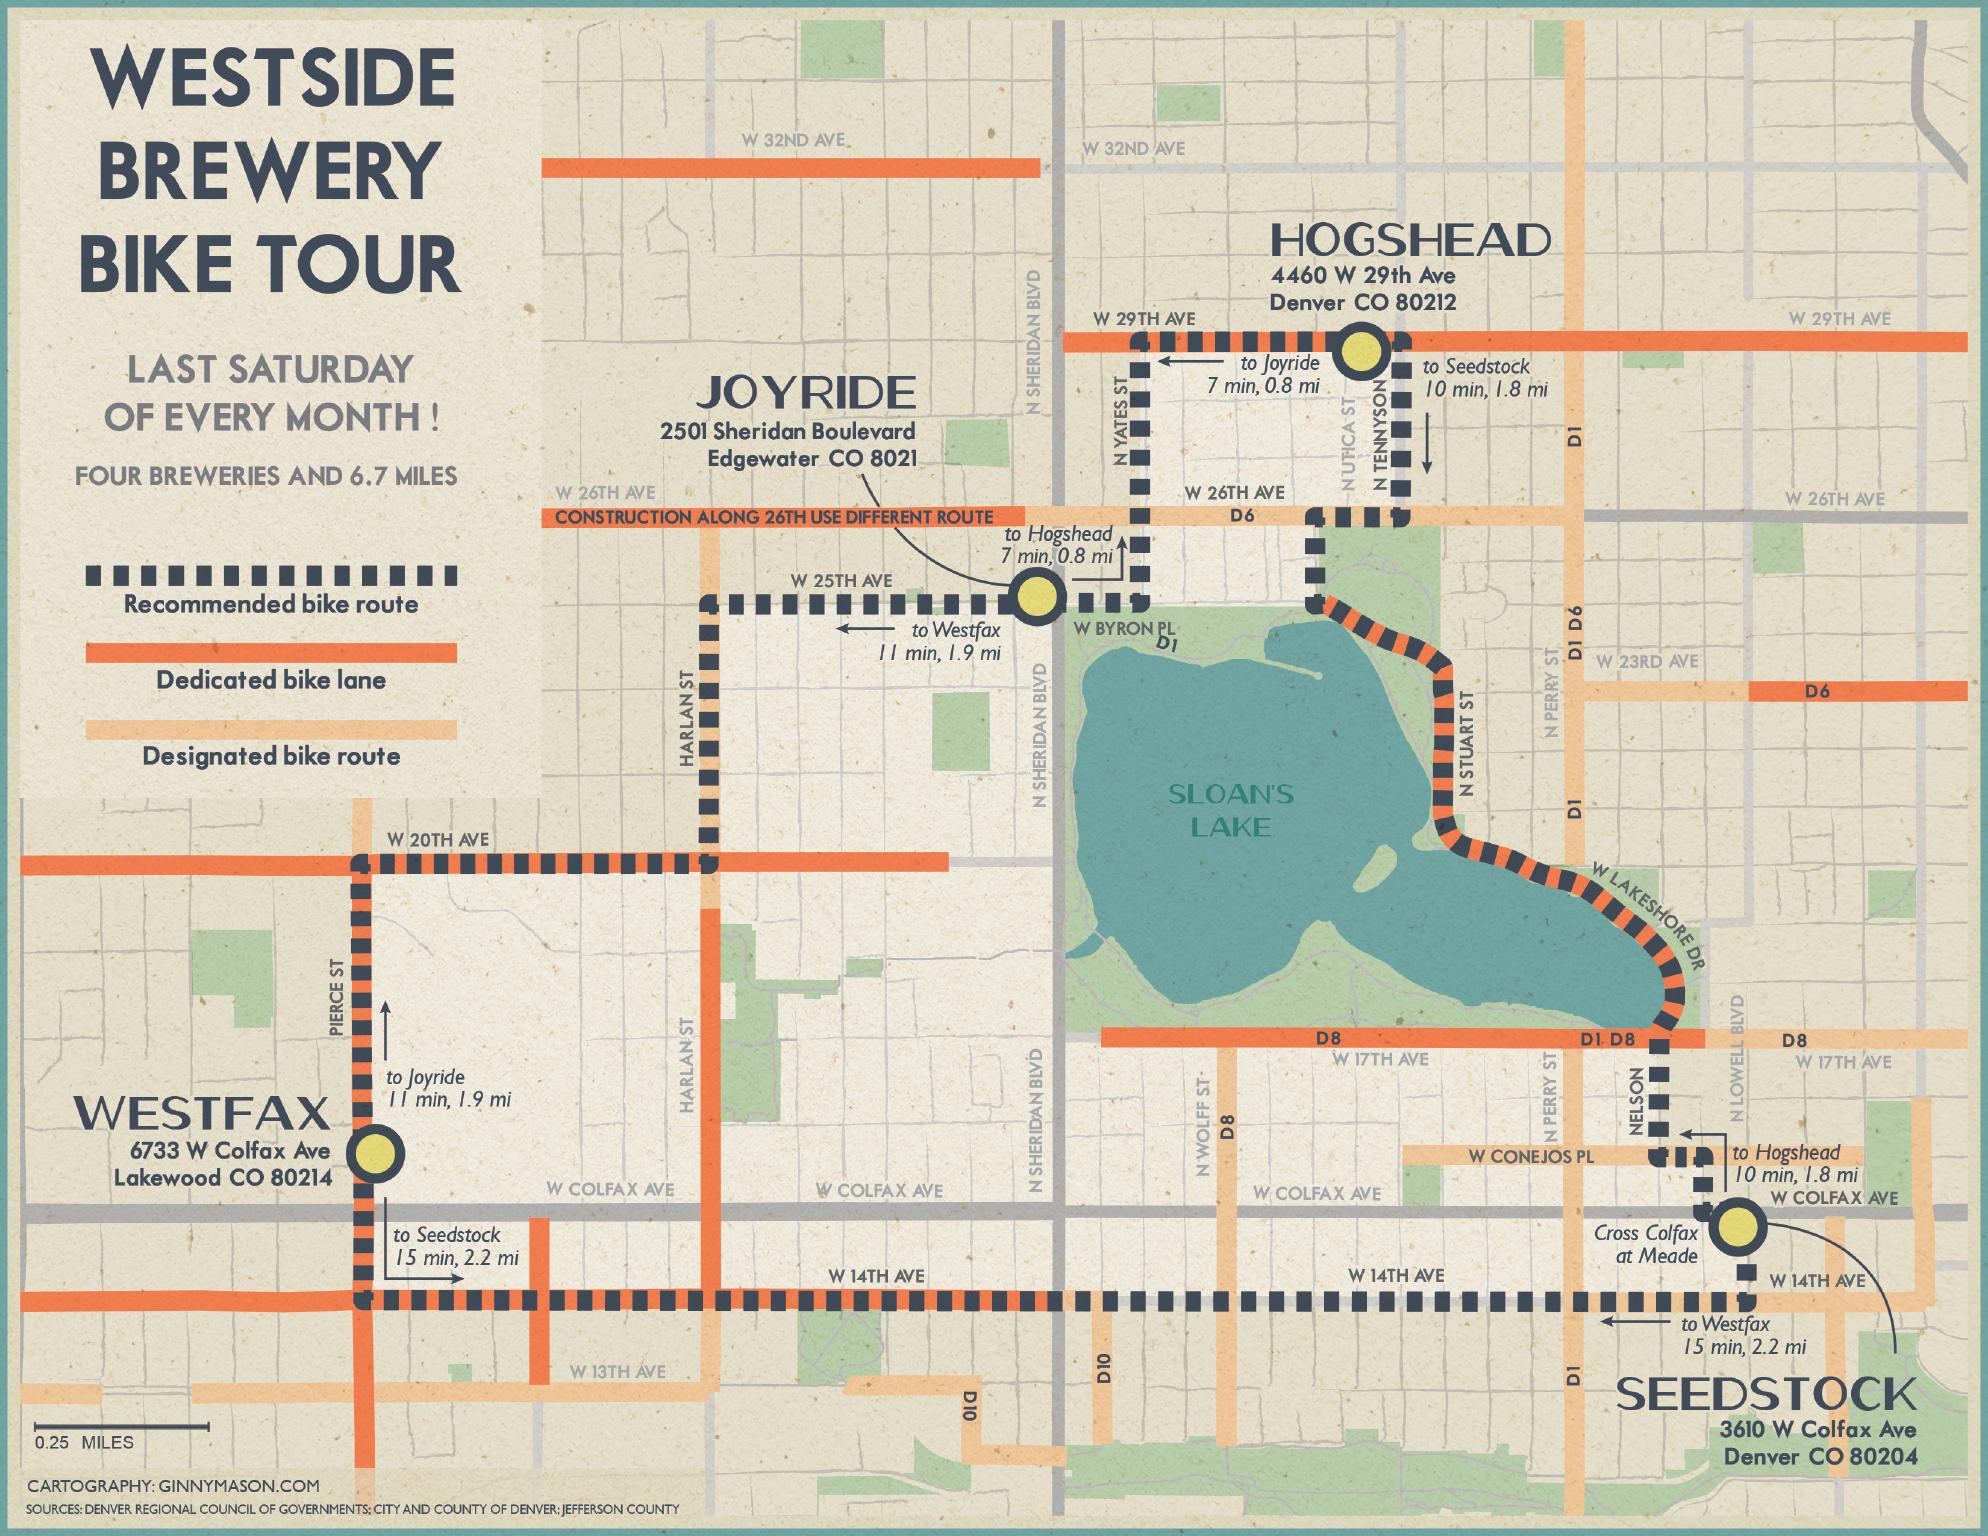 Westside Brewery Bike Tour